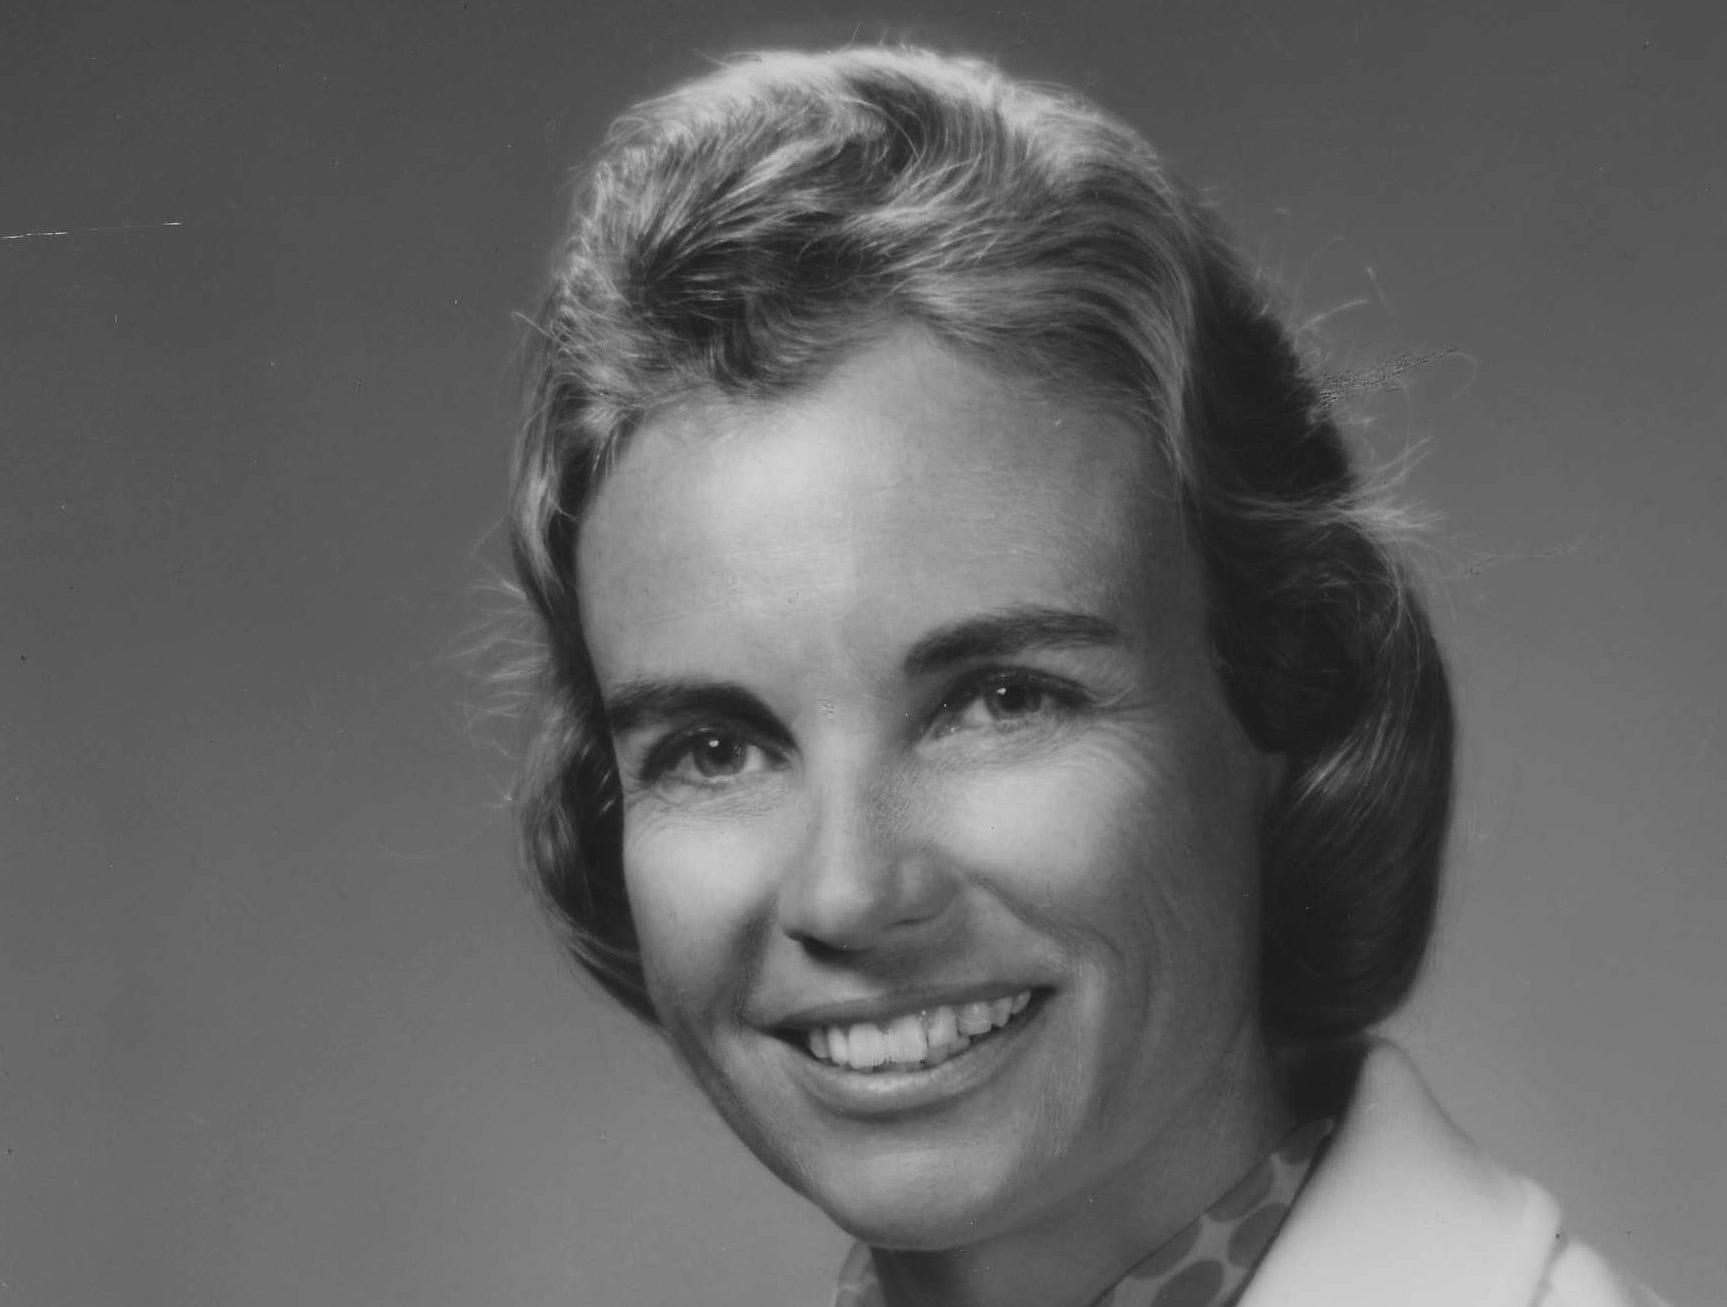 Arizona state Sen. Sandra Day O'Connor on May 11, 1970.